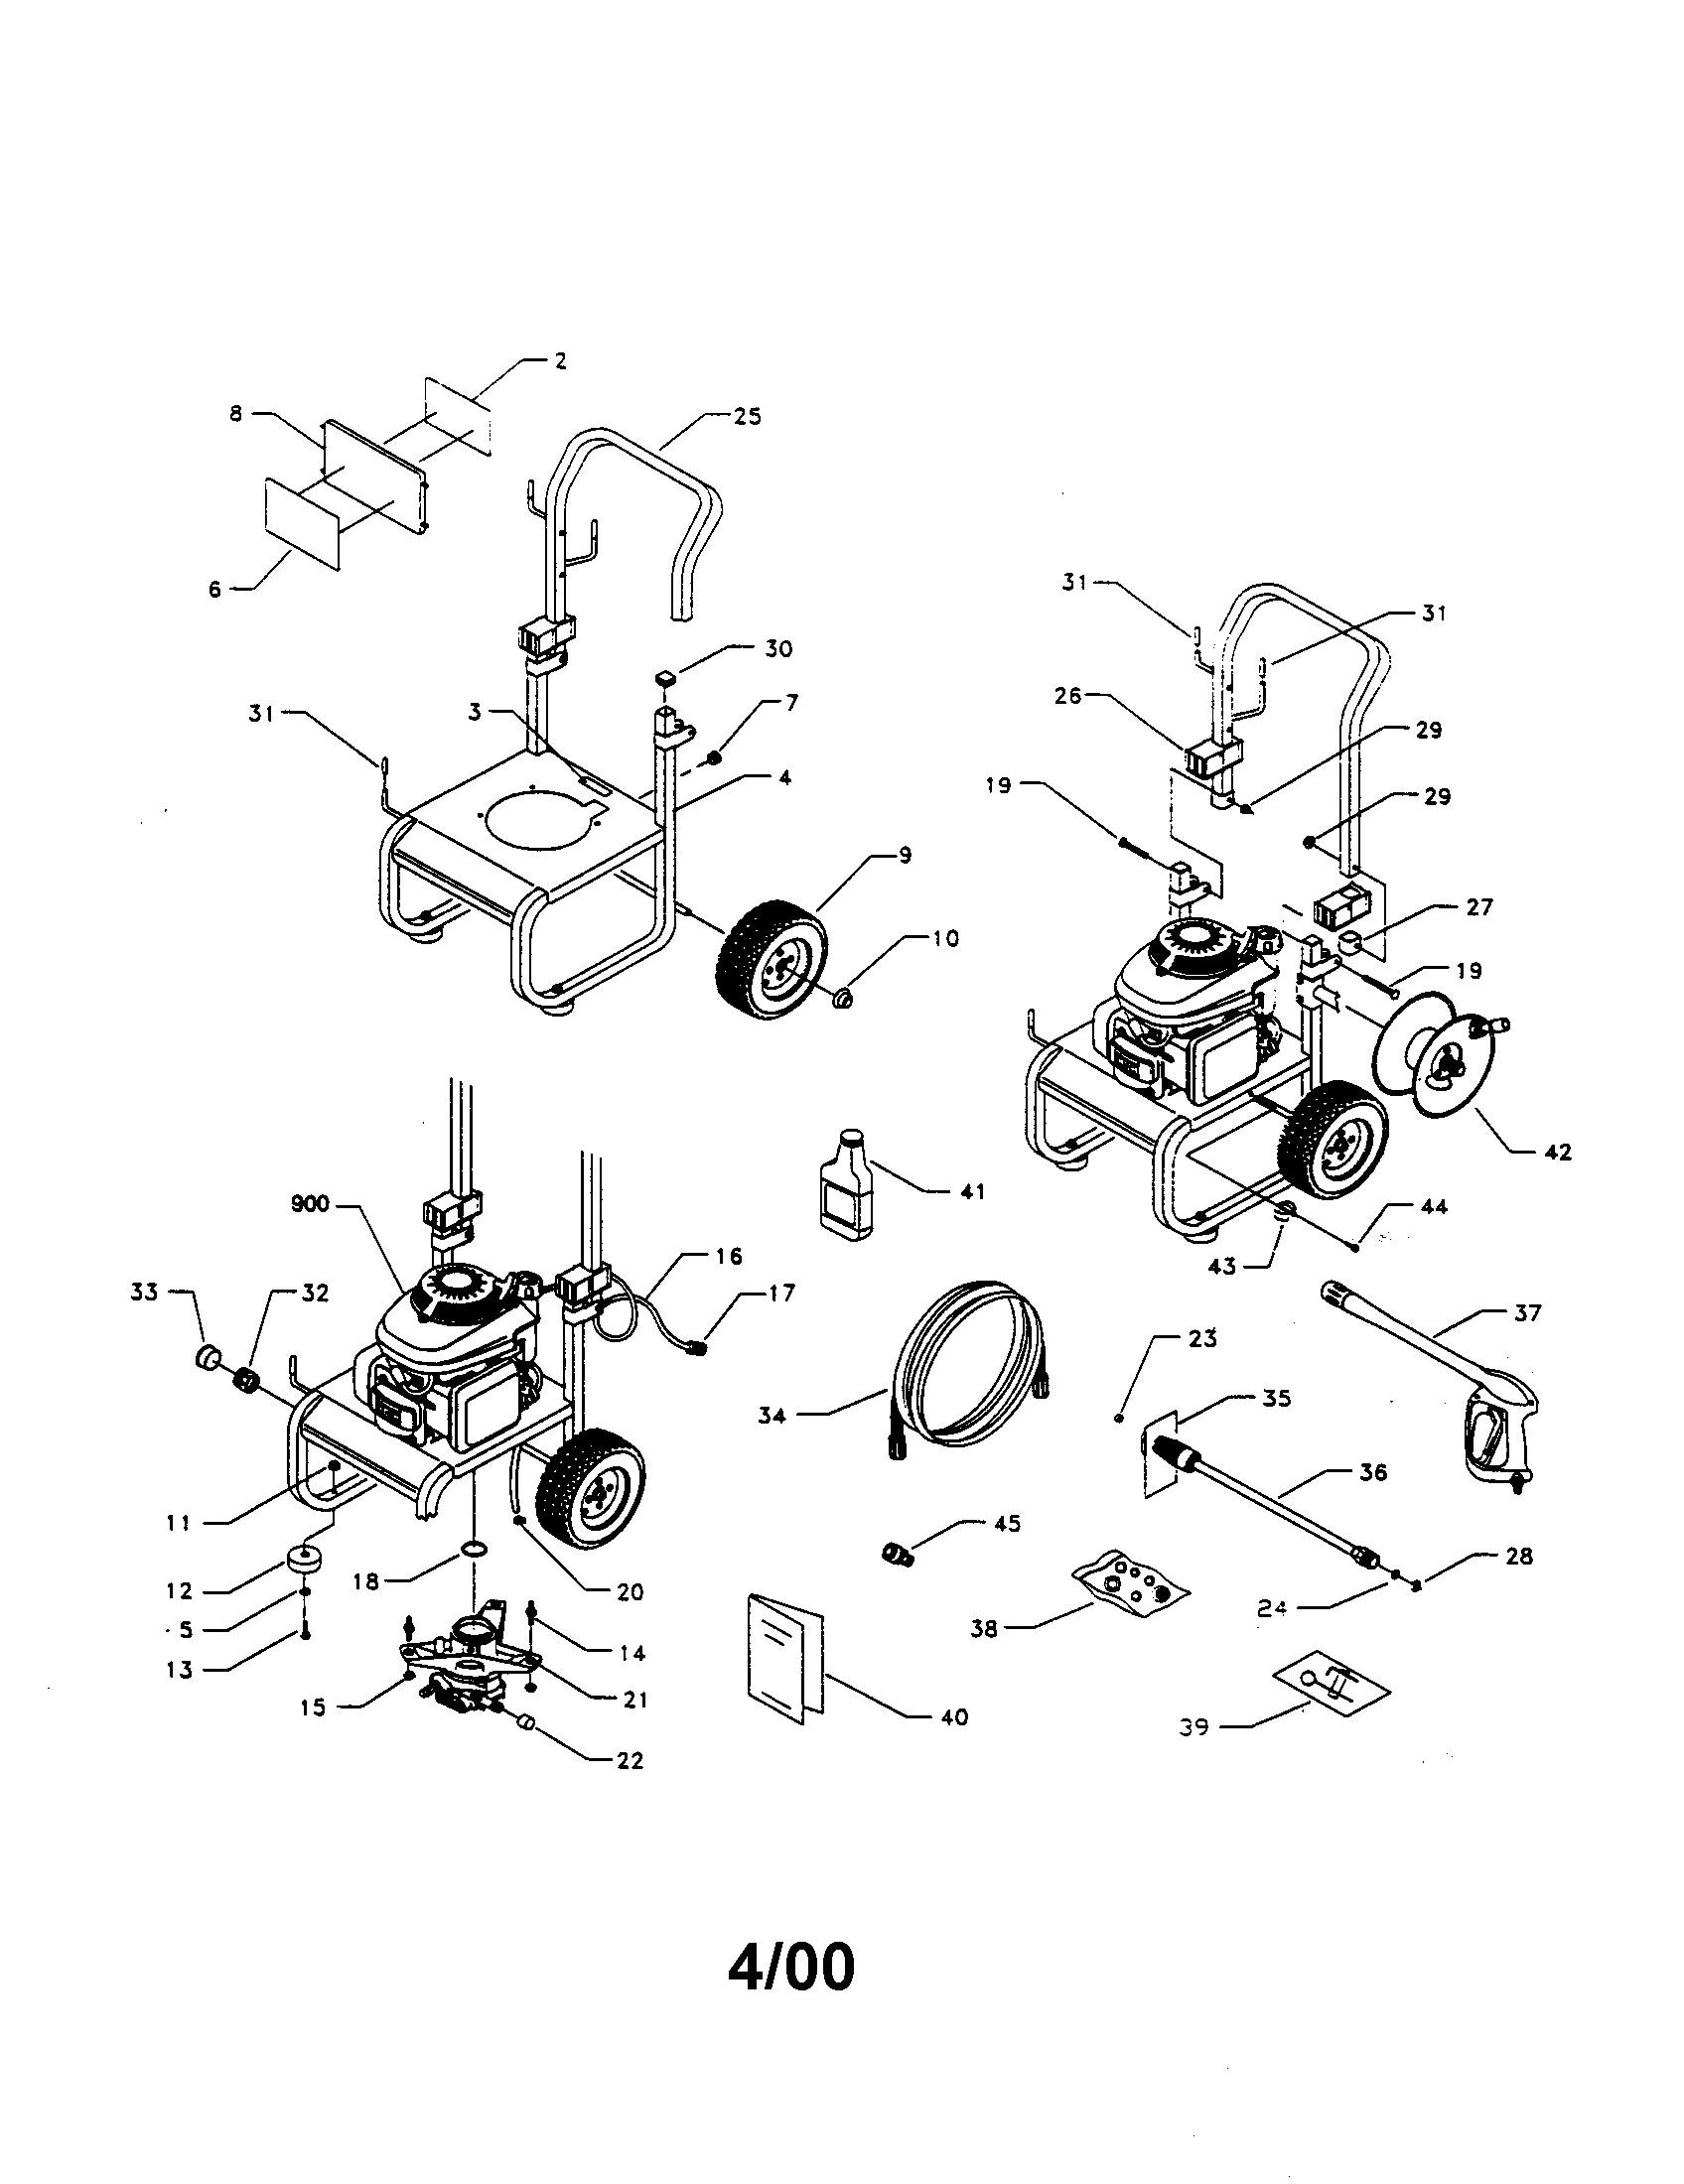 Honda 190 Pressure Washer Schematic